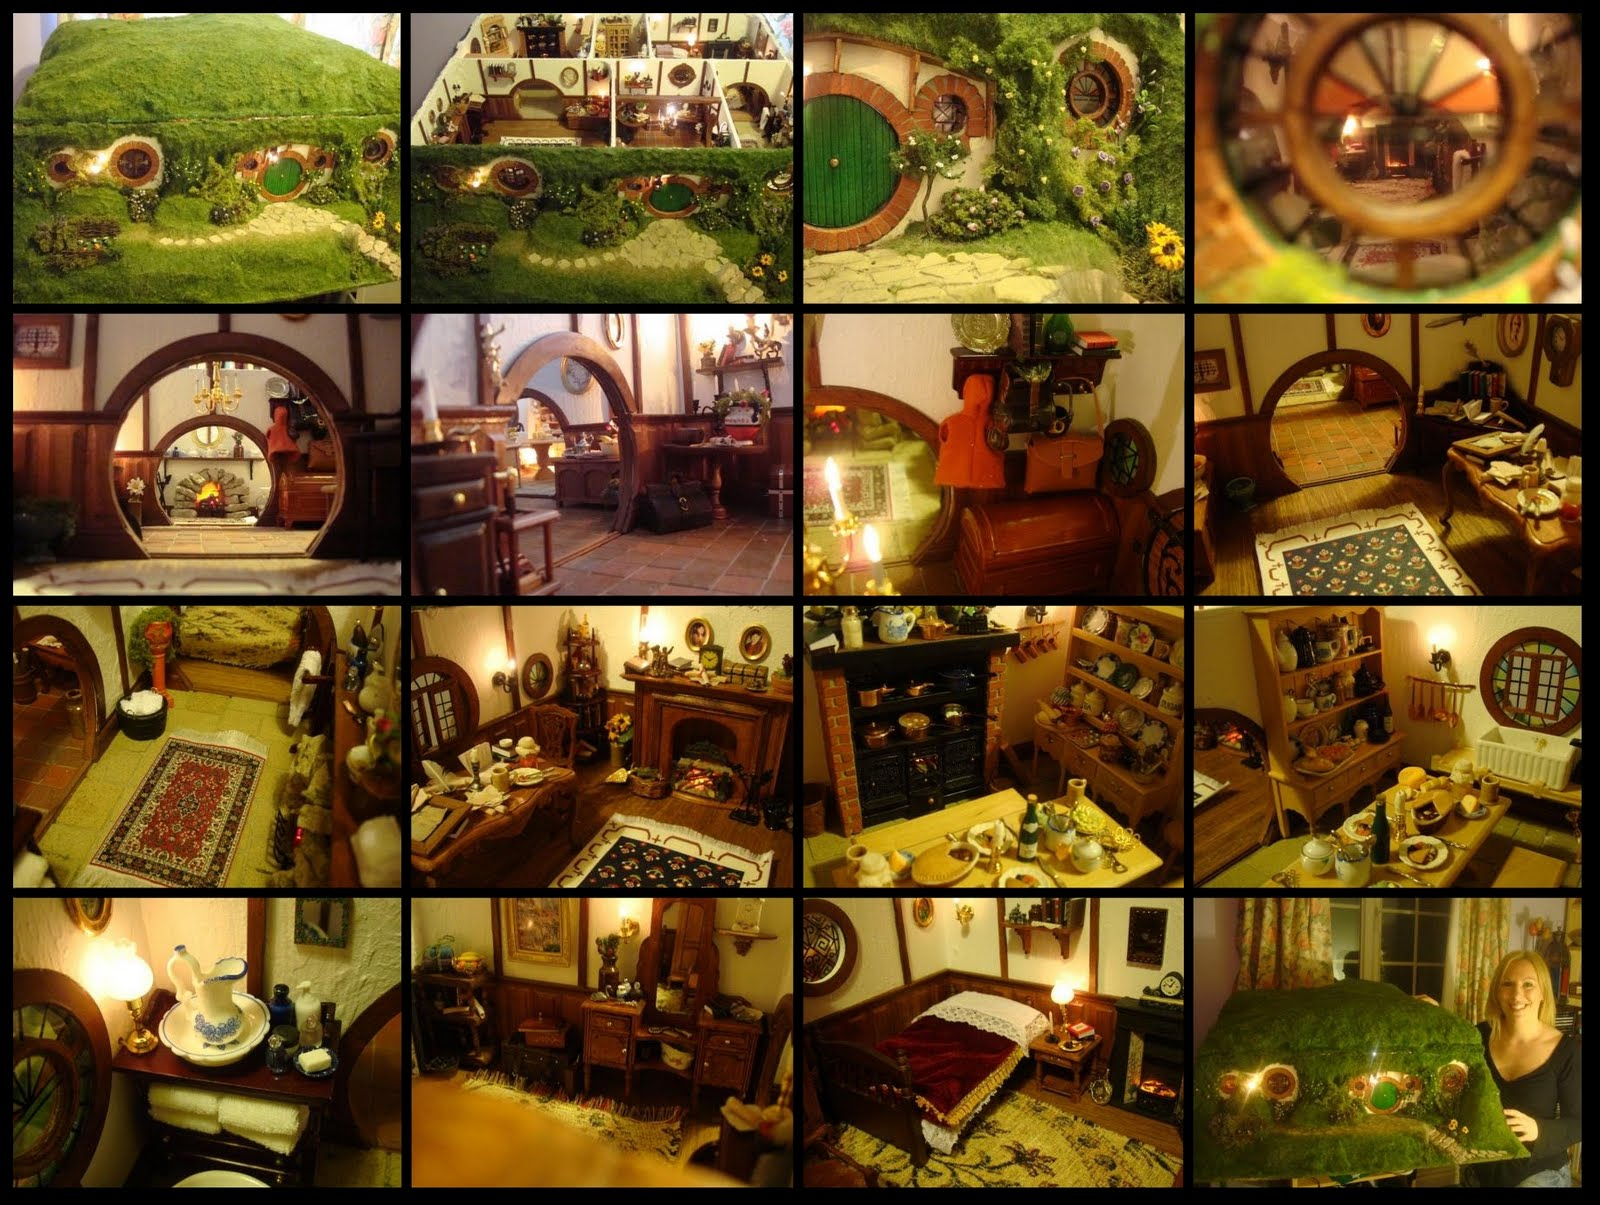 Of Bilbo Baggins Hobbit Hole Floor Plan   Green HoomeMad Chambers Hobbit Hole  Earth Berm Homes Floor Plans